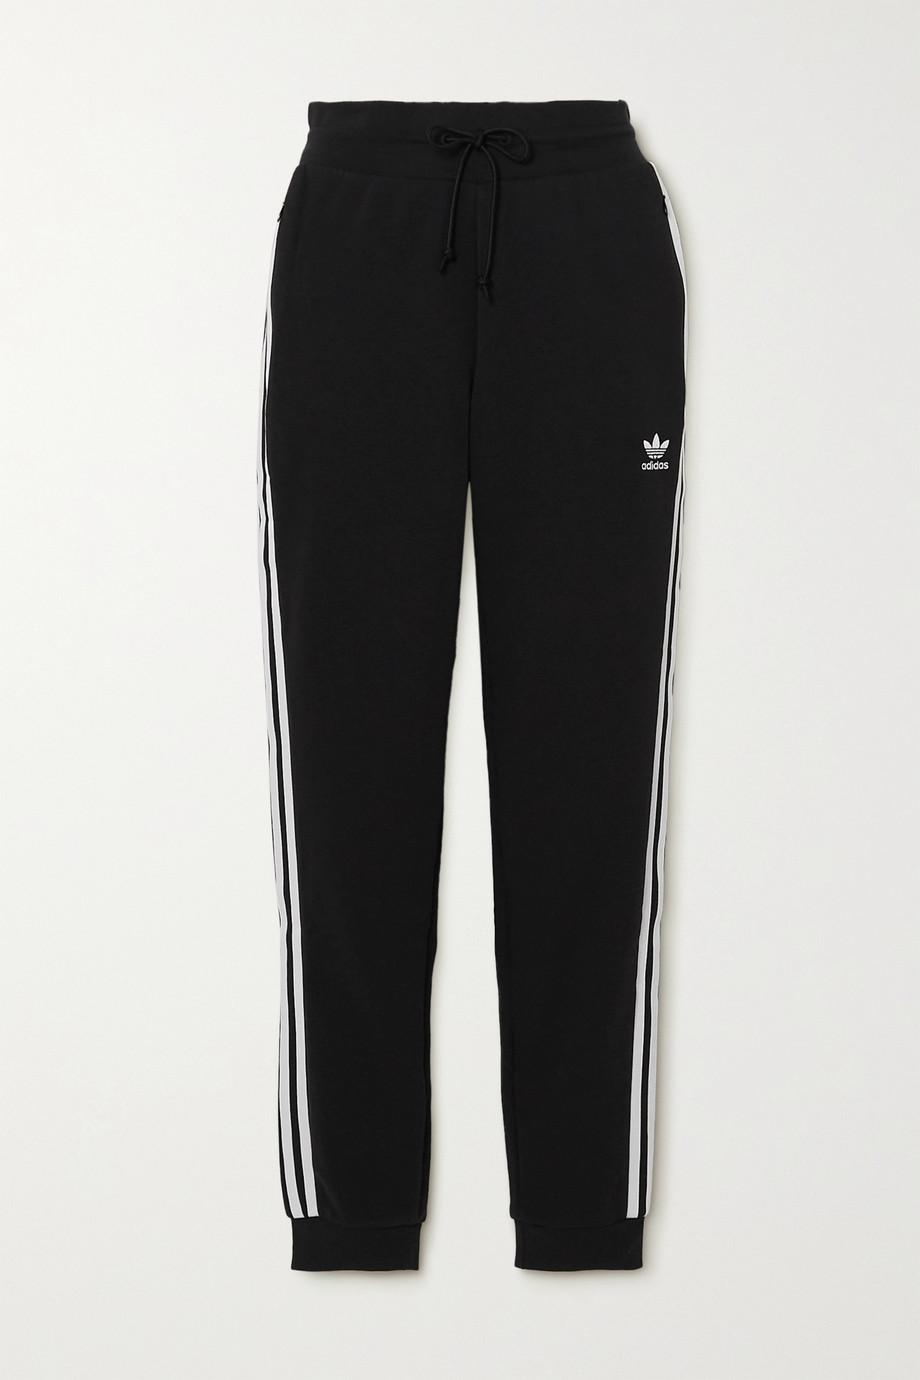 adidas Originals Adicolor striped cotton-blend jersey track pants